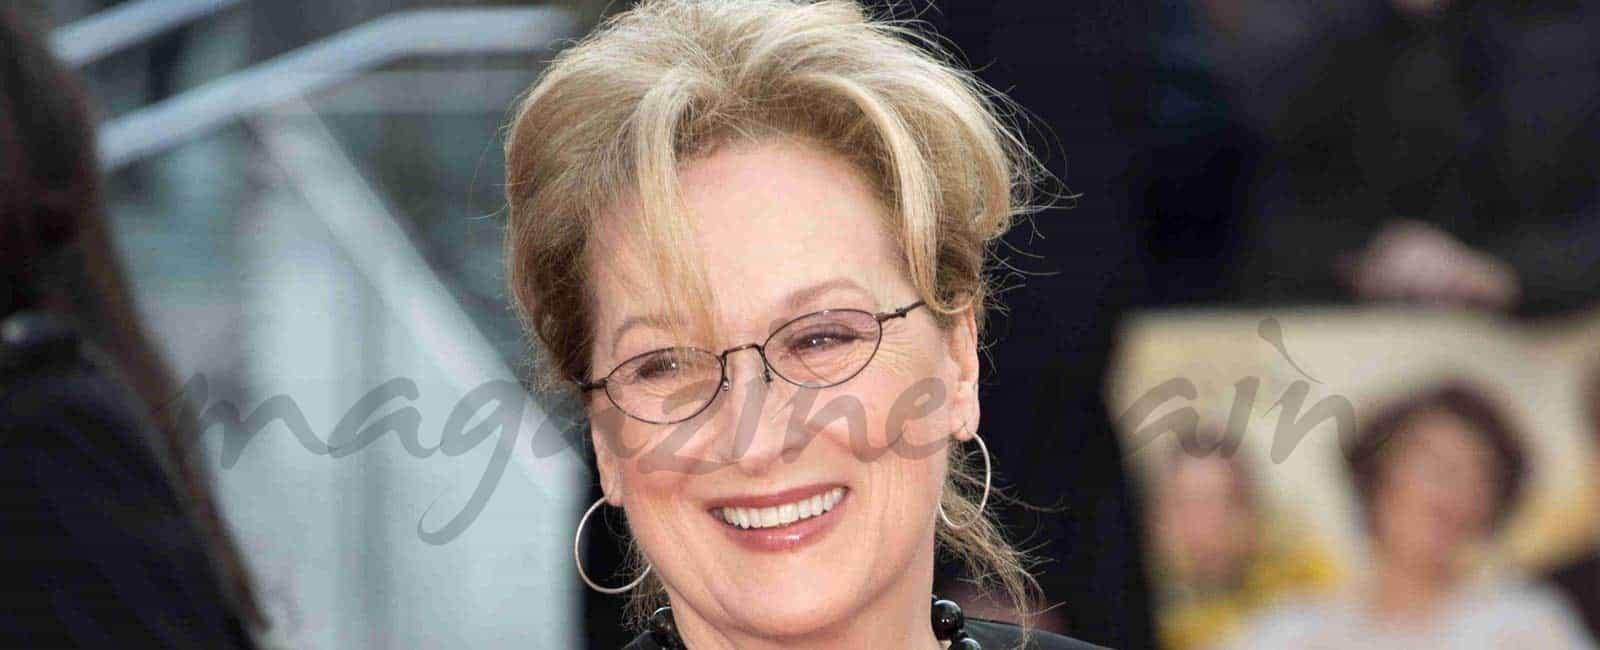 Así eran, Así son: Meryl Streep 2006-2016